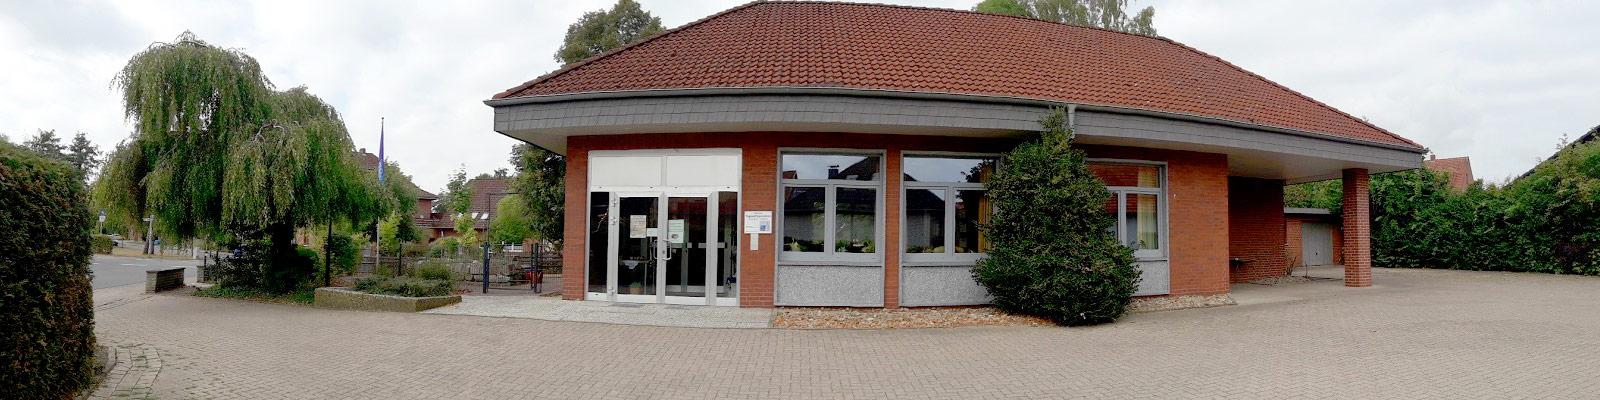 Diakonie Pflegedient Schaumburg Standort Meerbeck